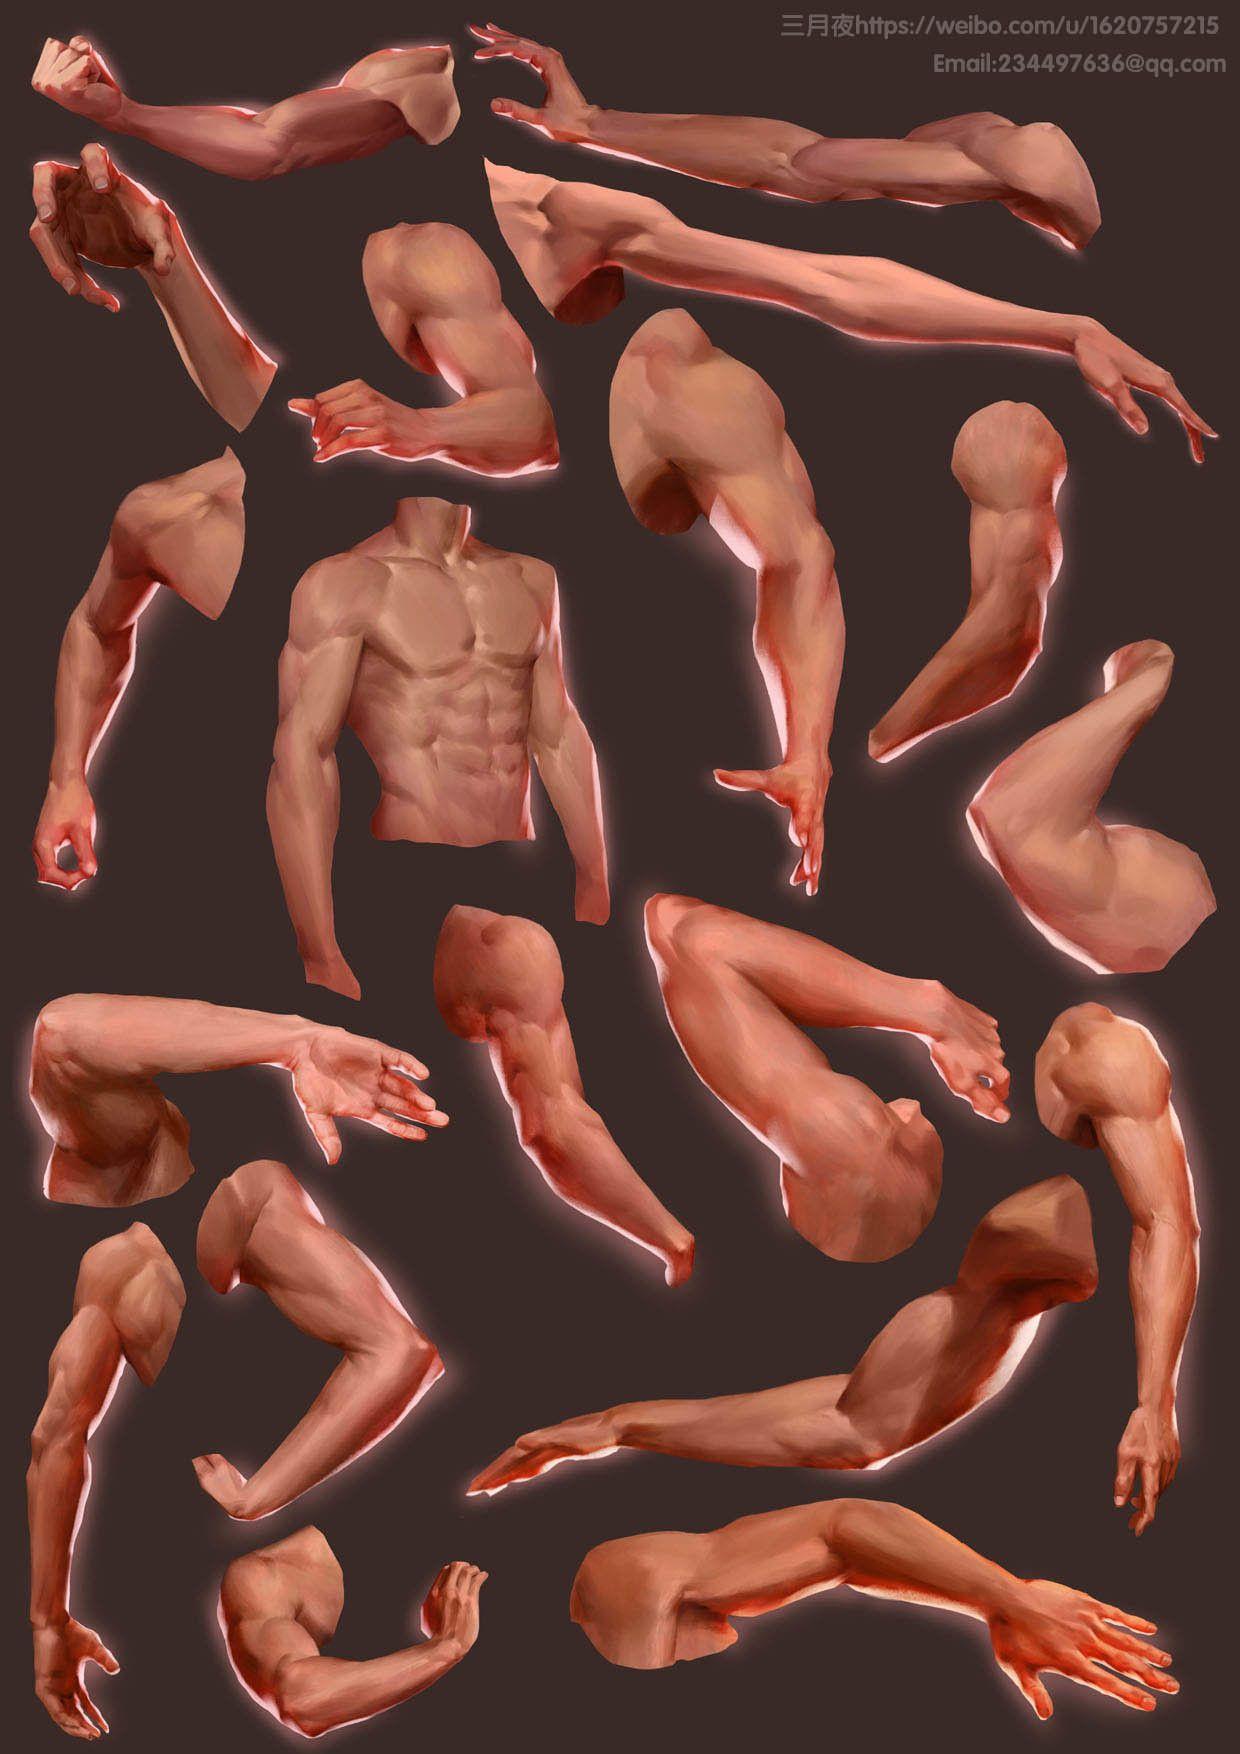 ArtStation - arms, Qi Chen   Anatomía masculina   Pinterest ...